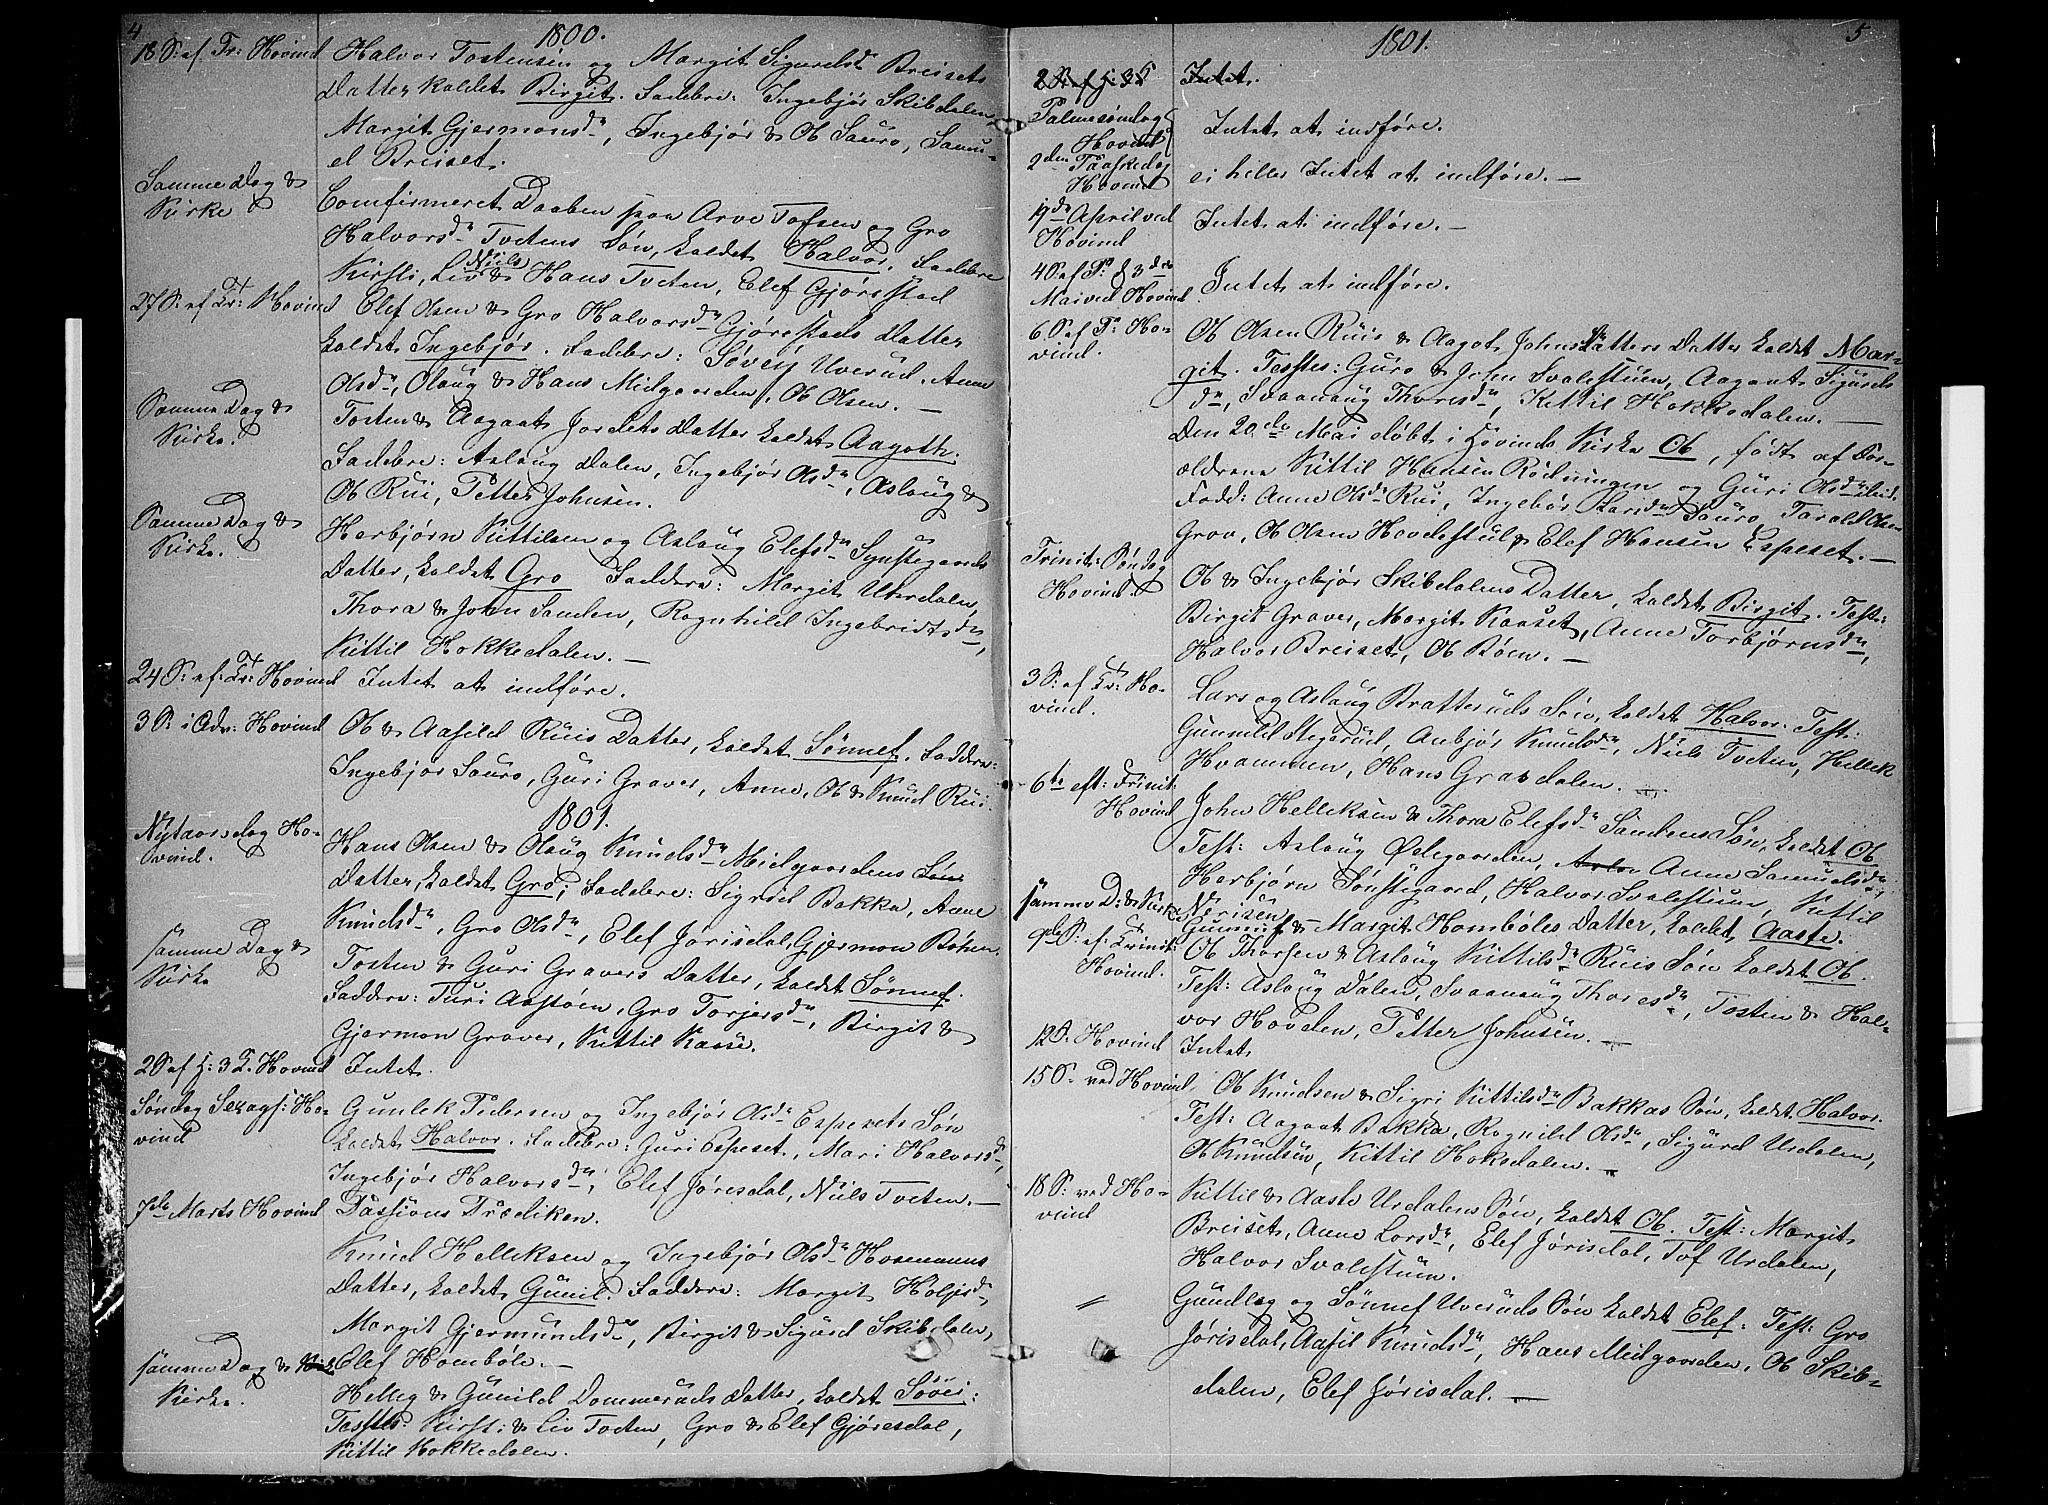 SAKO, Gransherad kirkebøker, F/Fb/L0001: Ministerialbok nr. II 1, 1800-1814, s. 4-5